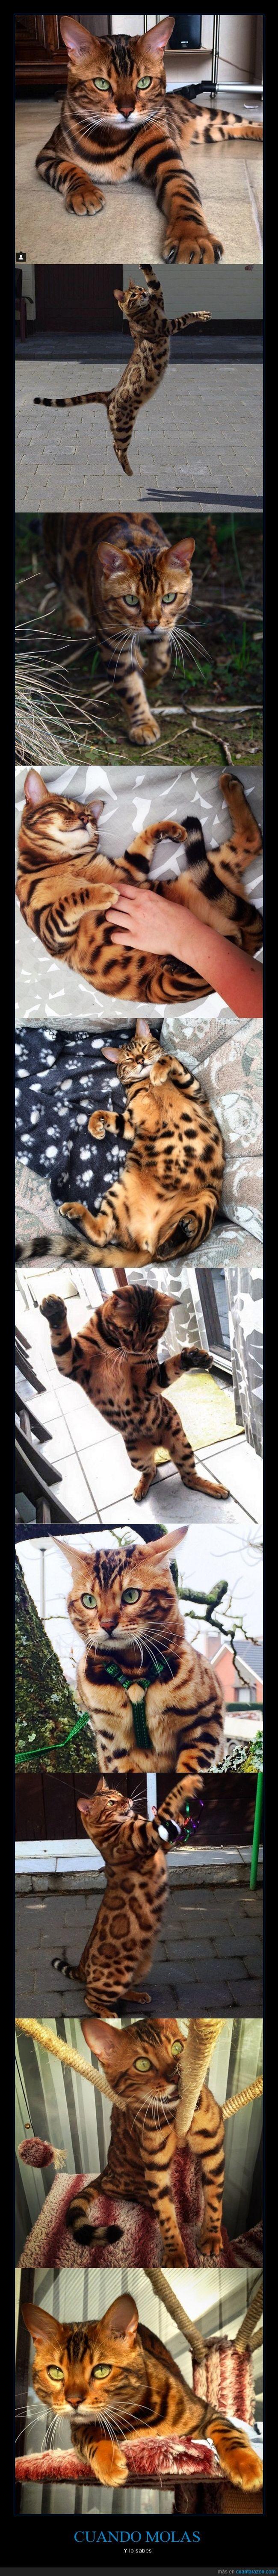 gato,guepardo,pelaje,piel,thor